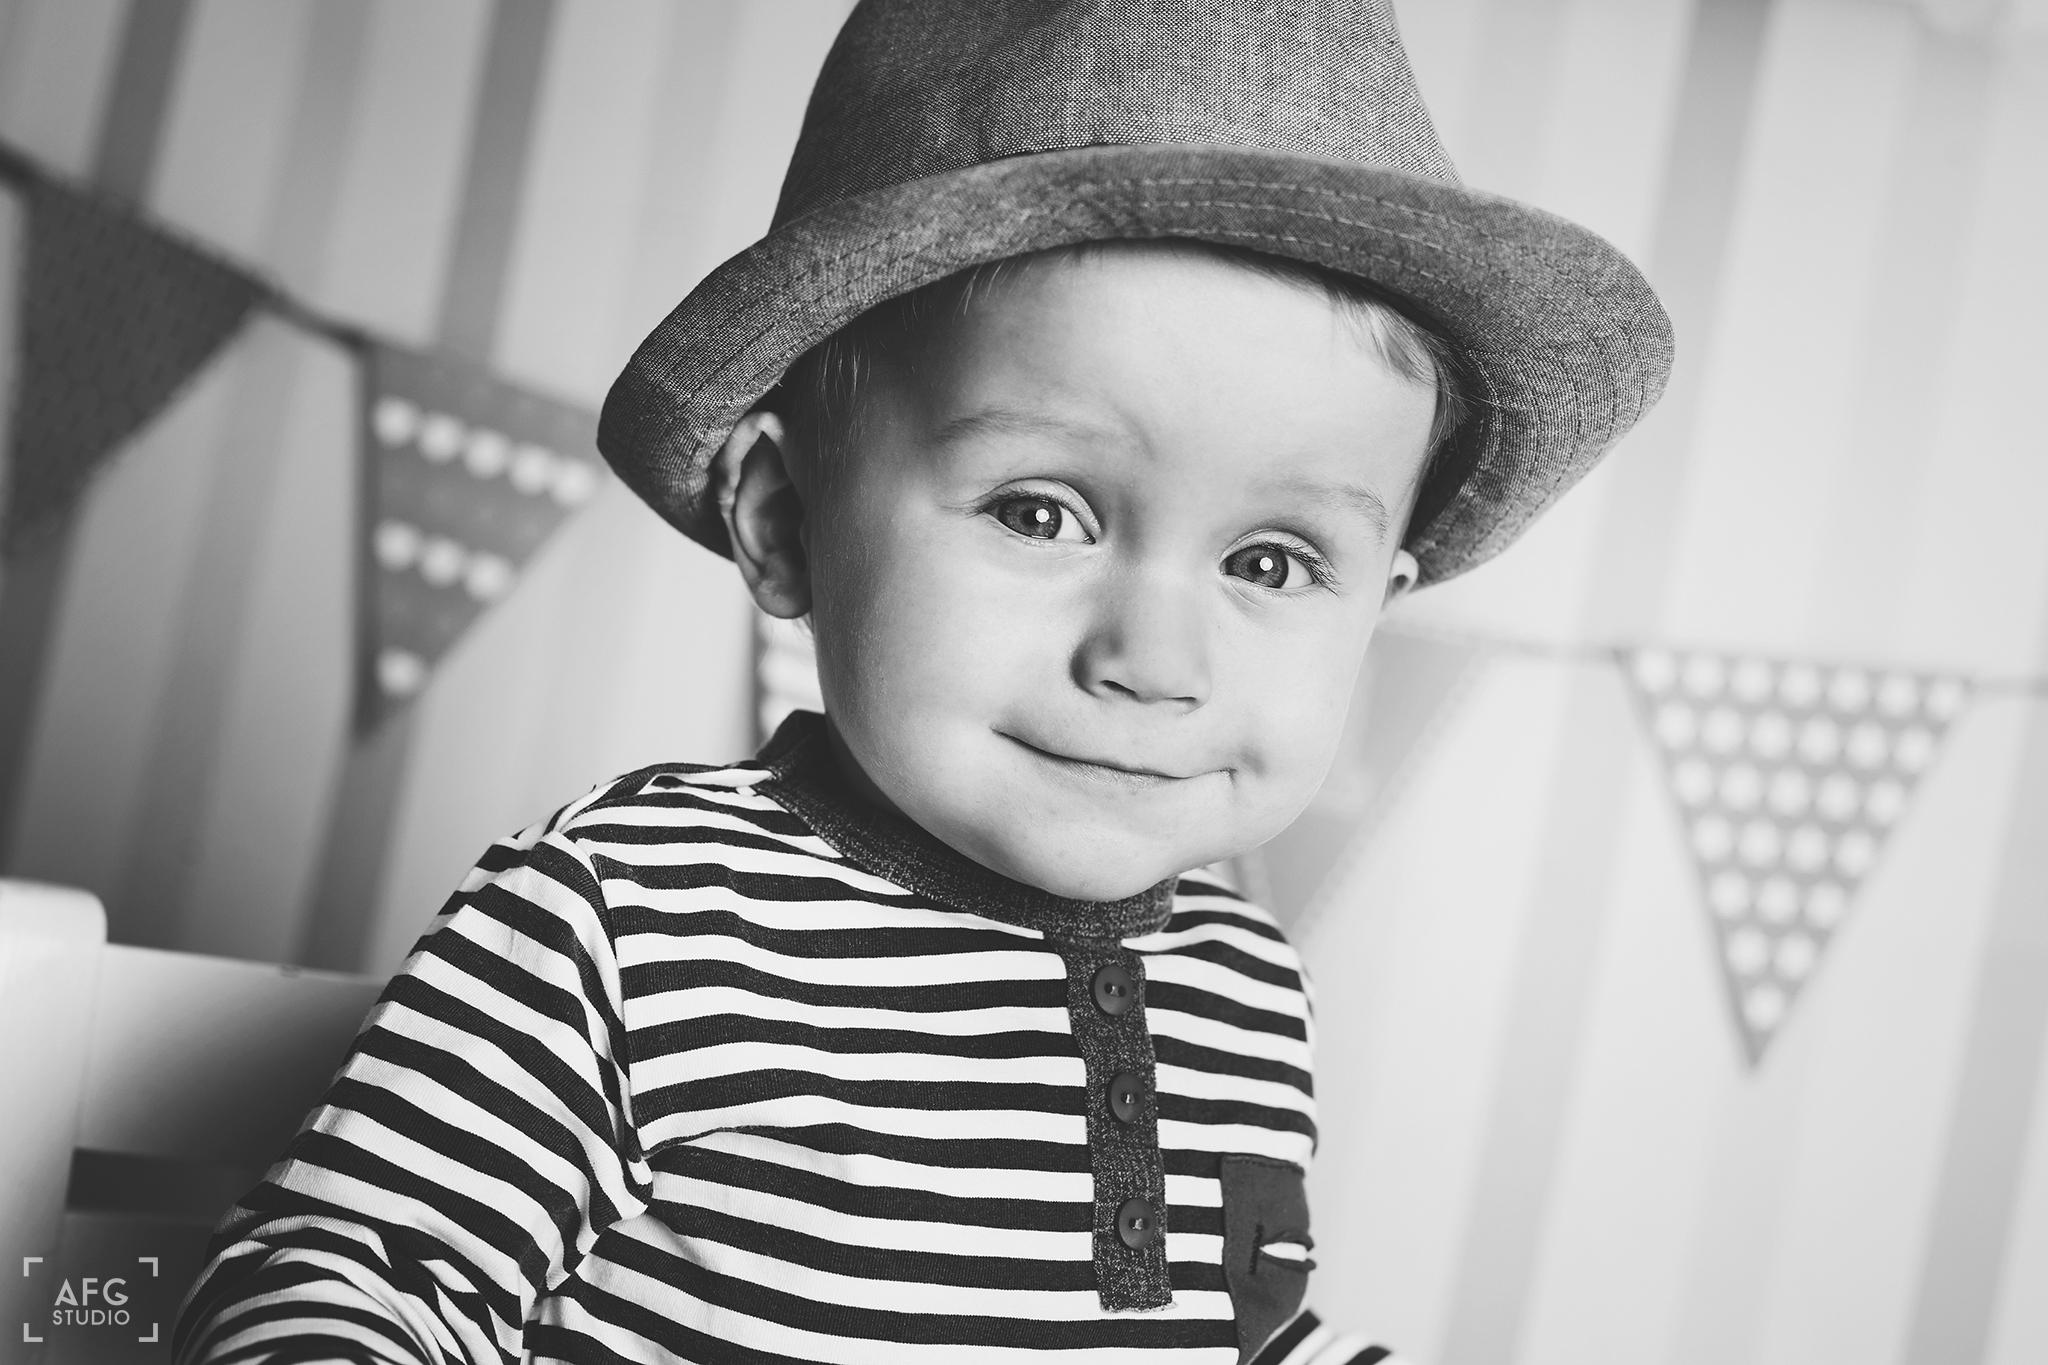 kapelusz, chłopiec, girlanda